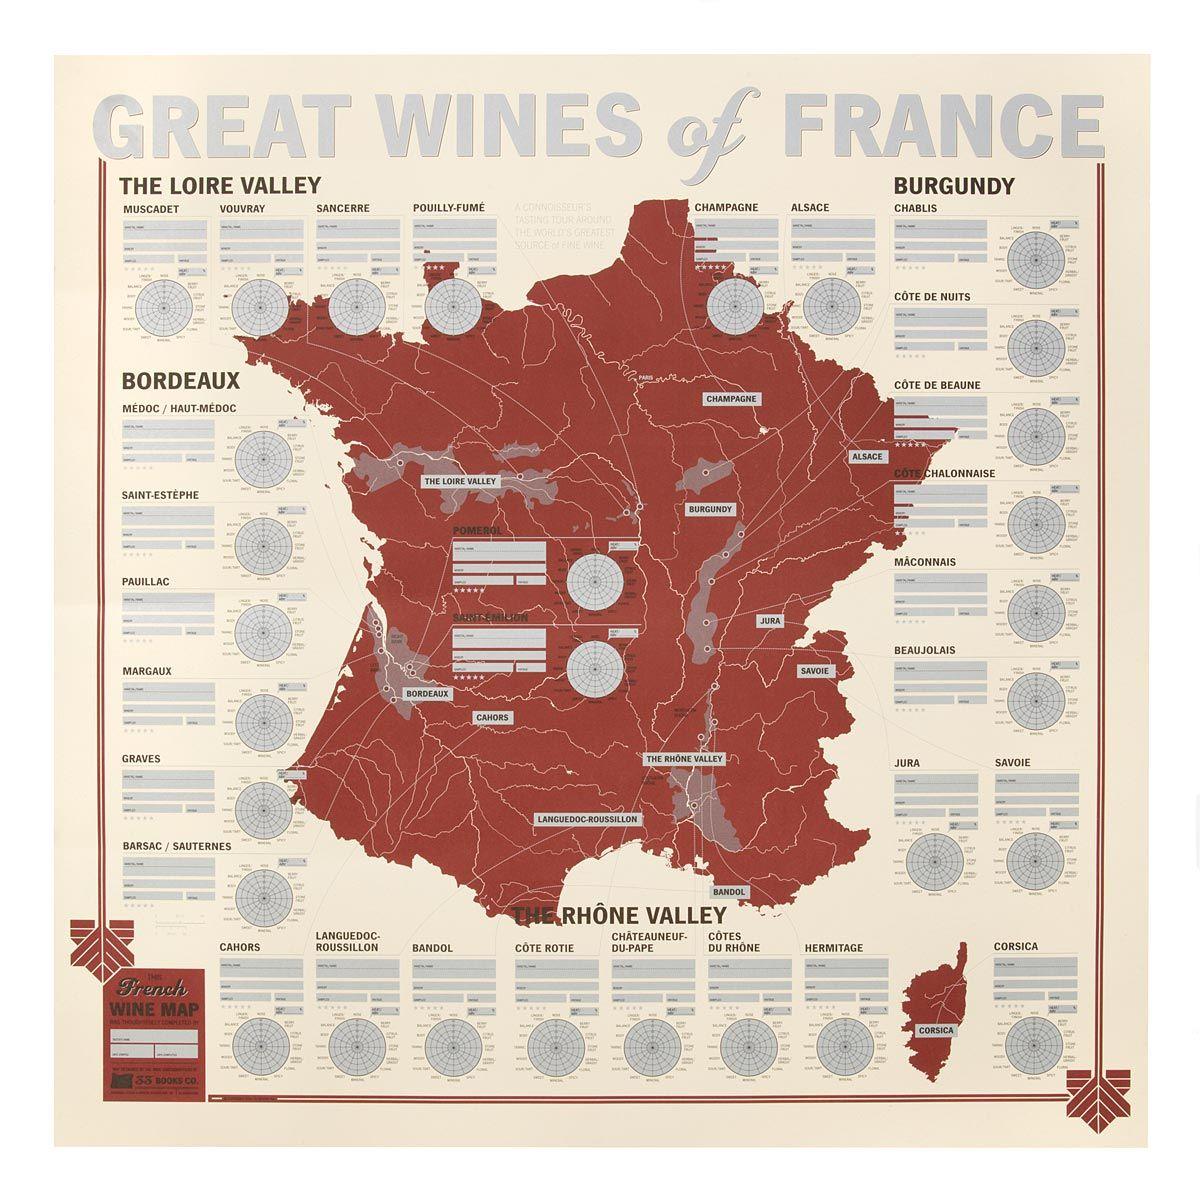 Great Wines Of France Tasting Map Tudo Sobre Vinhos Wine Vinhos Vinhos